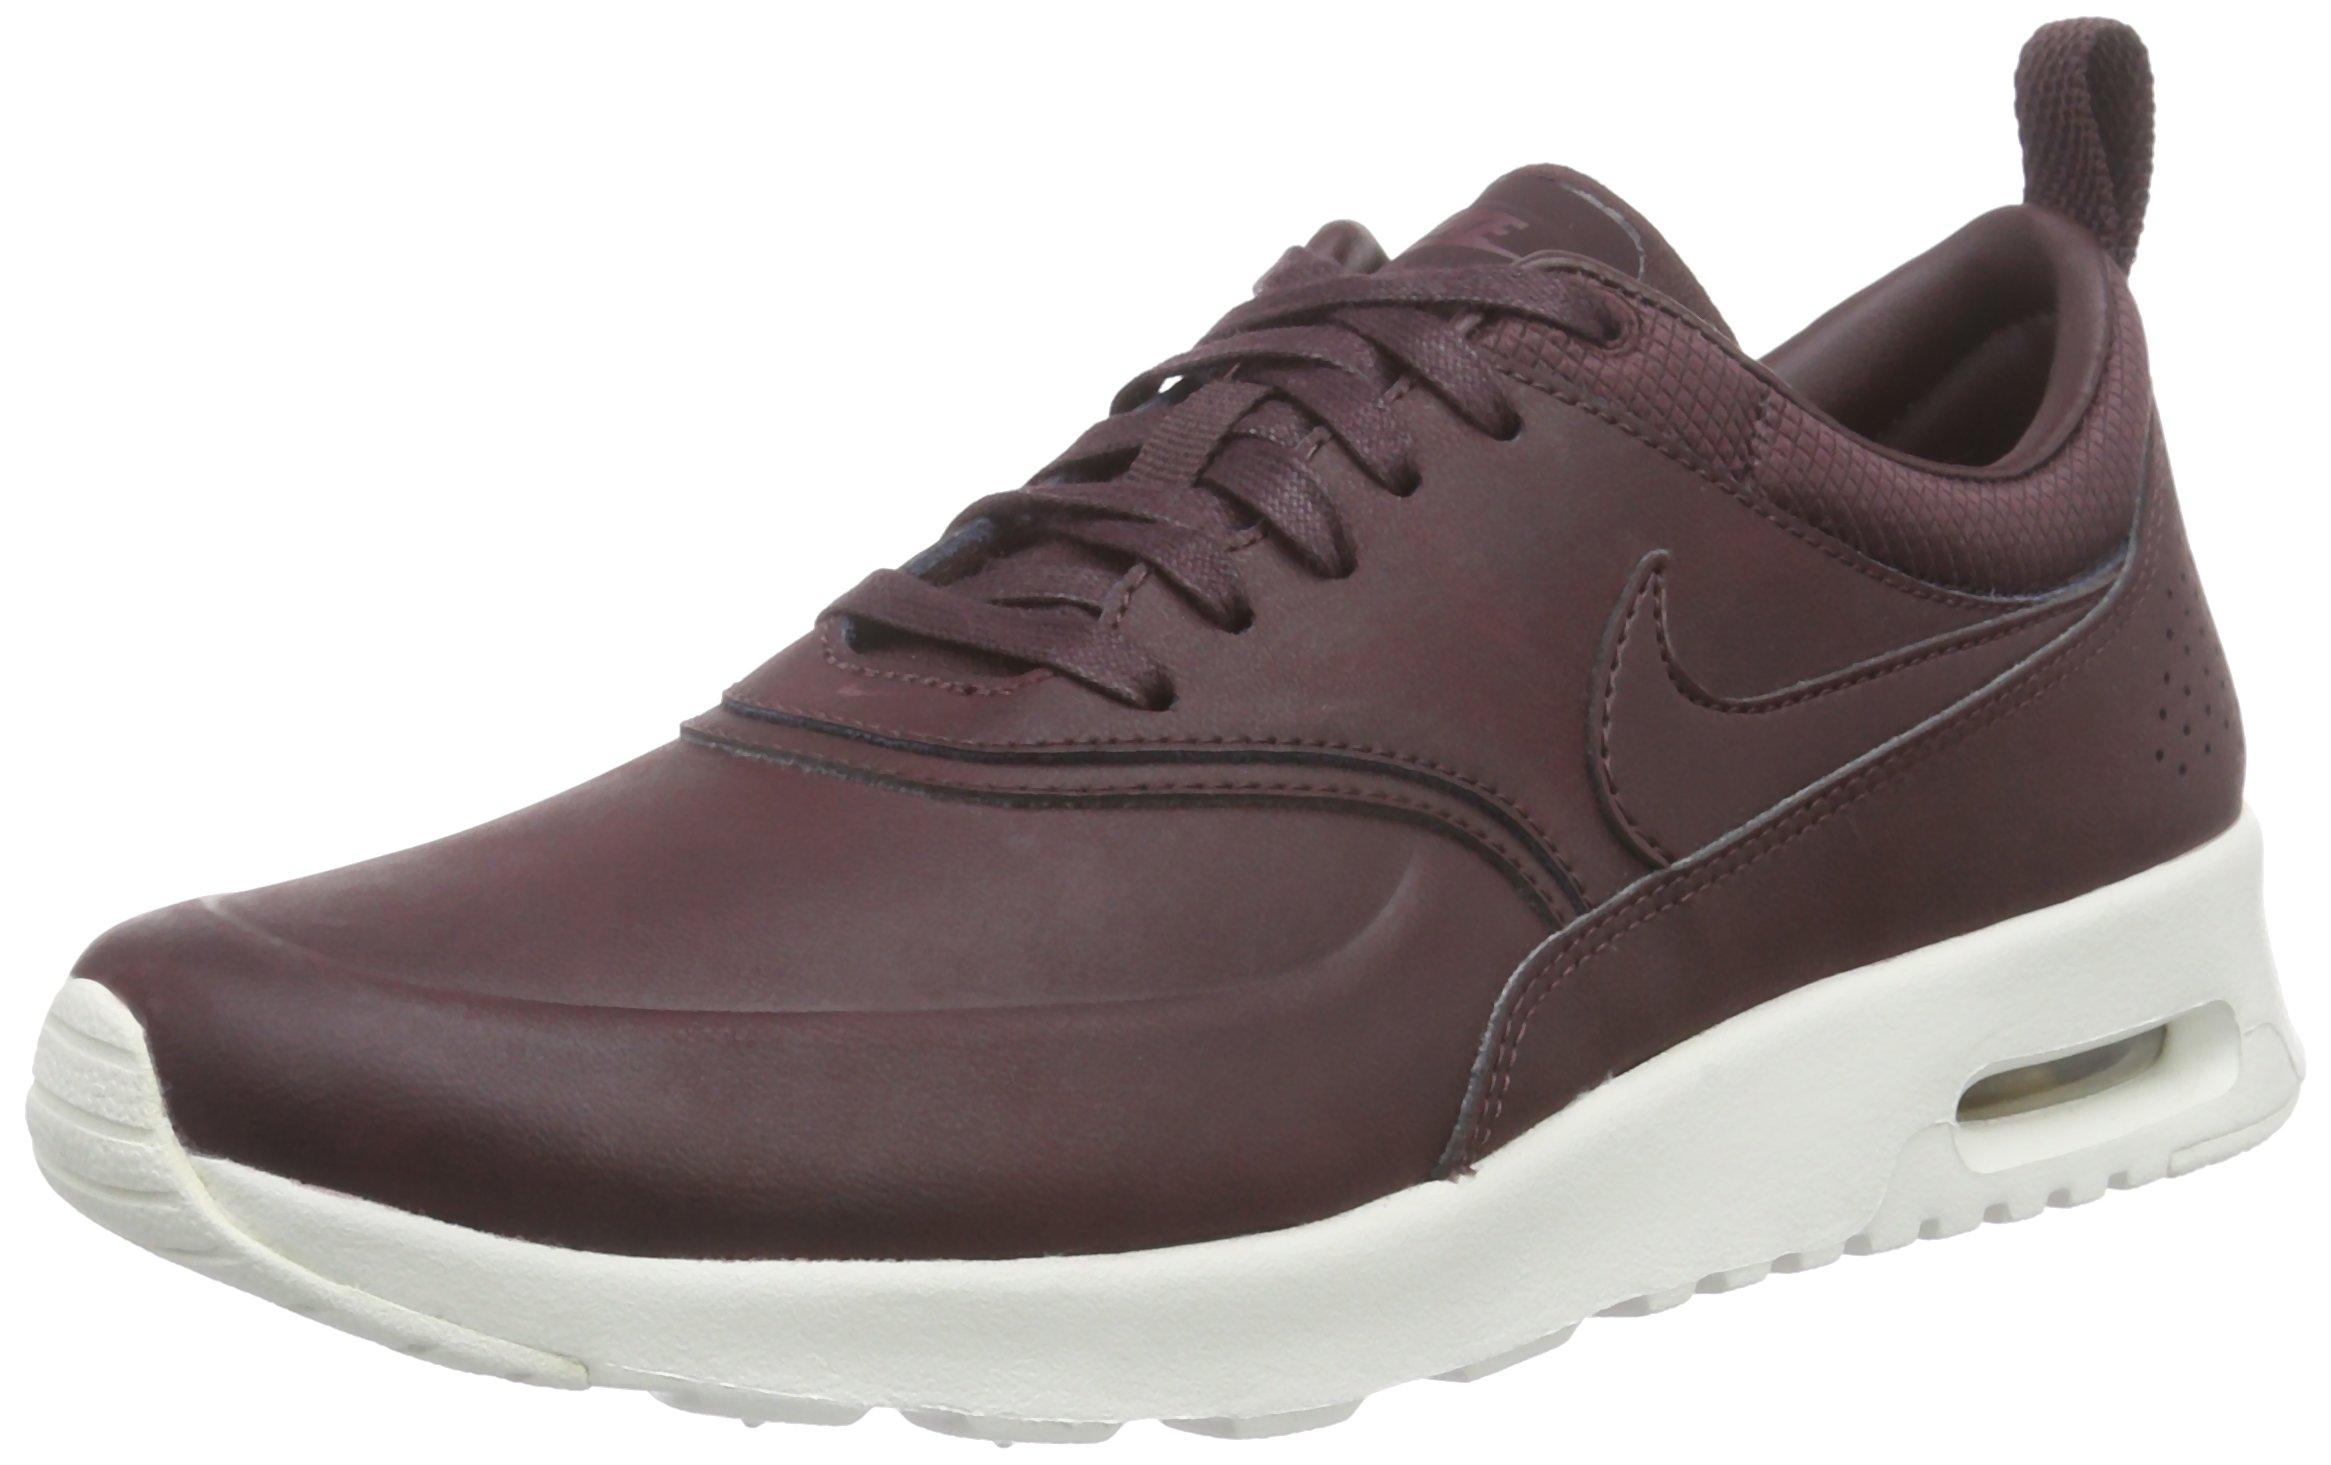 huge discount f454a 07b63 Galleon - Nike Women s Air Max Thea PRM Mahogany Mahogany Team Red Sl  Running Shoe 7 Women US